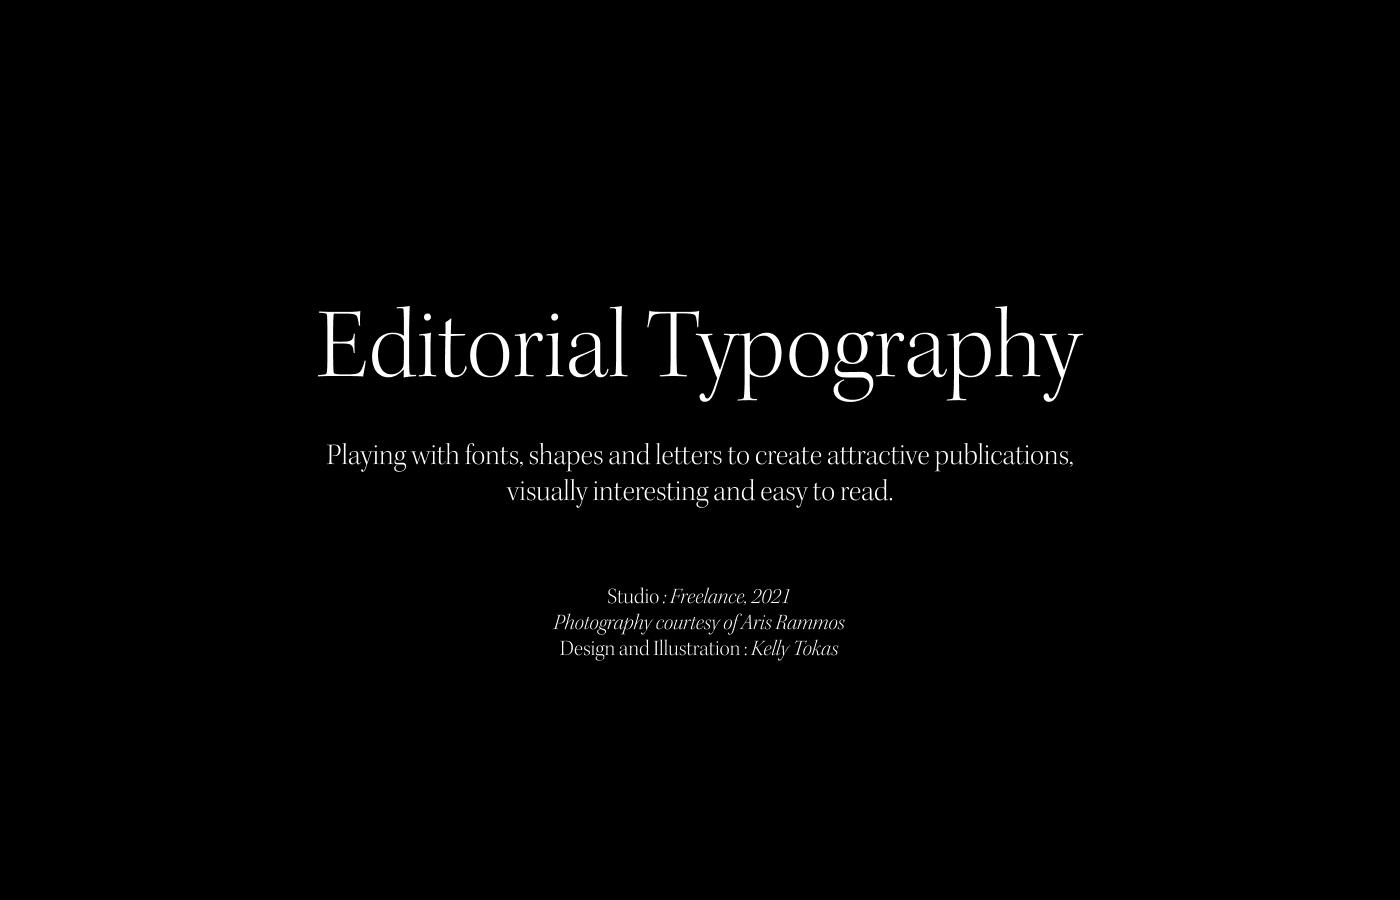 cursive fashion editorial fashion magazine Figma ILLUSTRATION  lettering Logo Design typography   Visual Communication